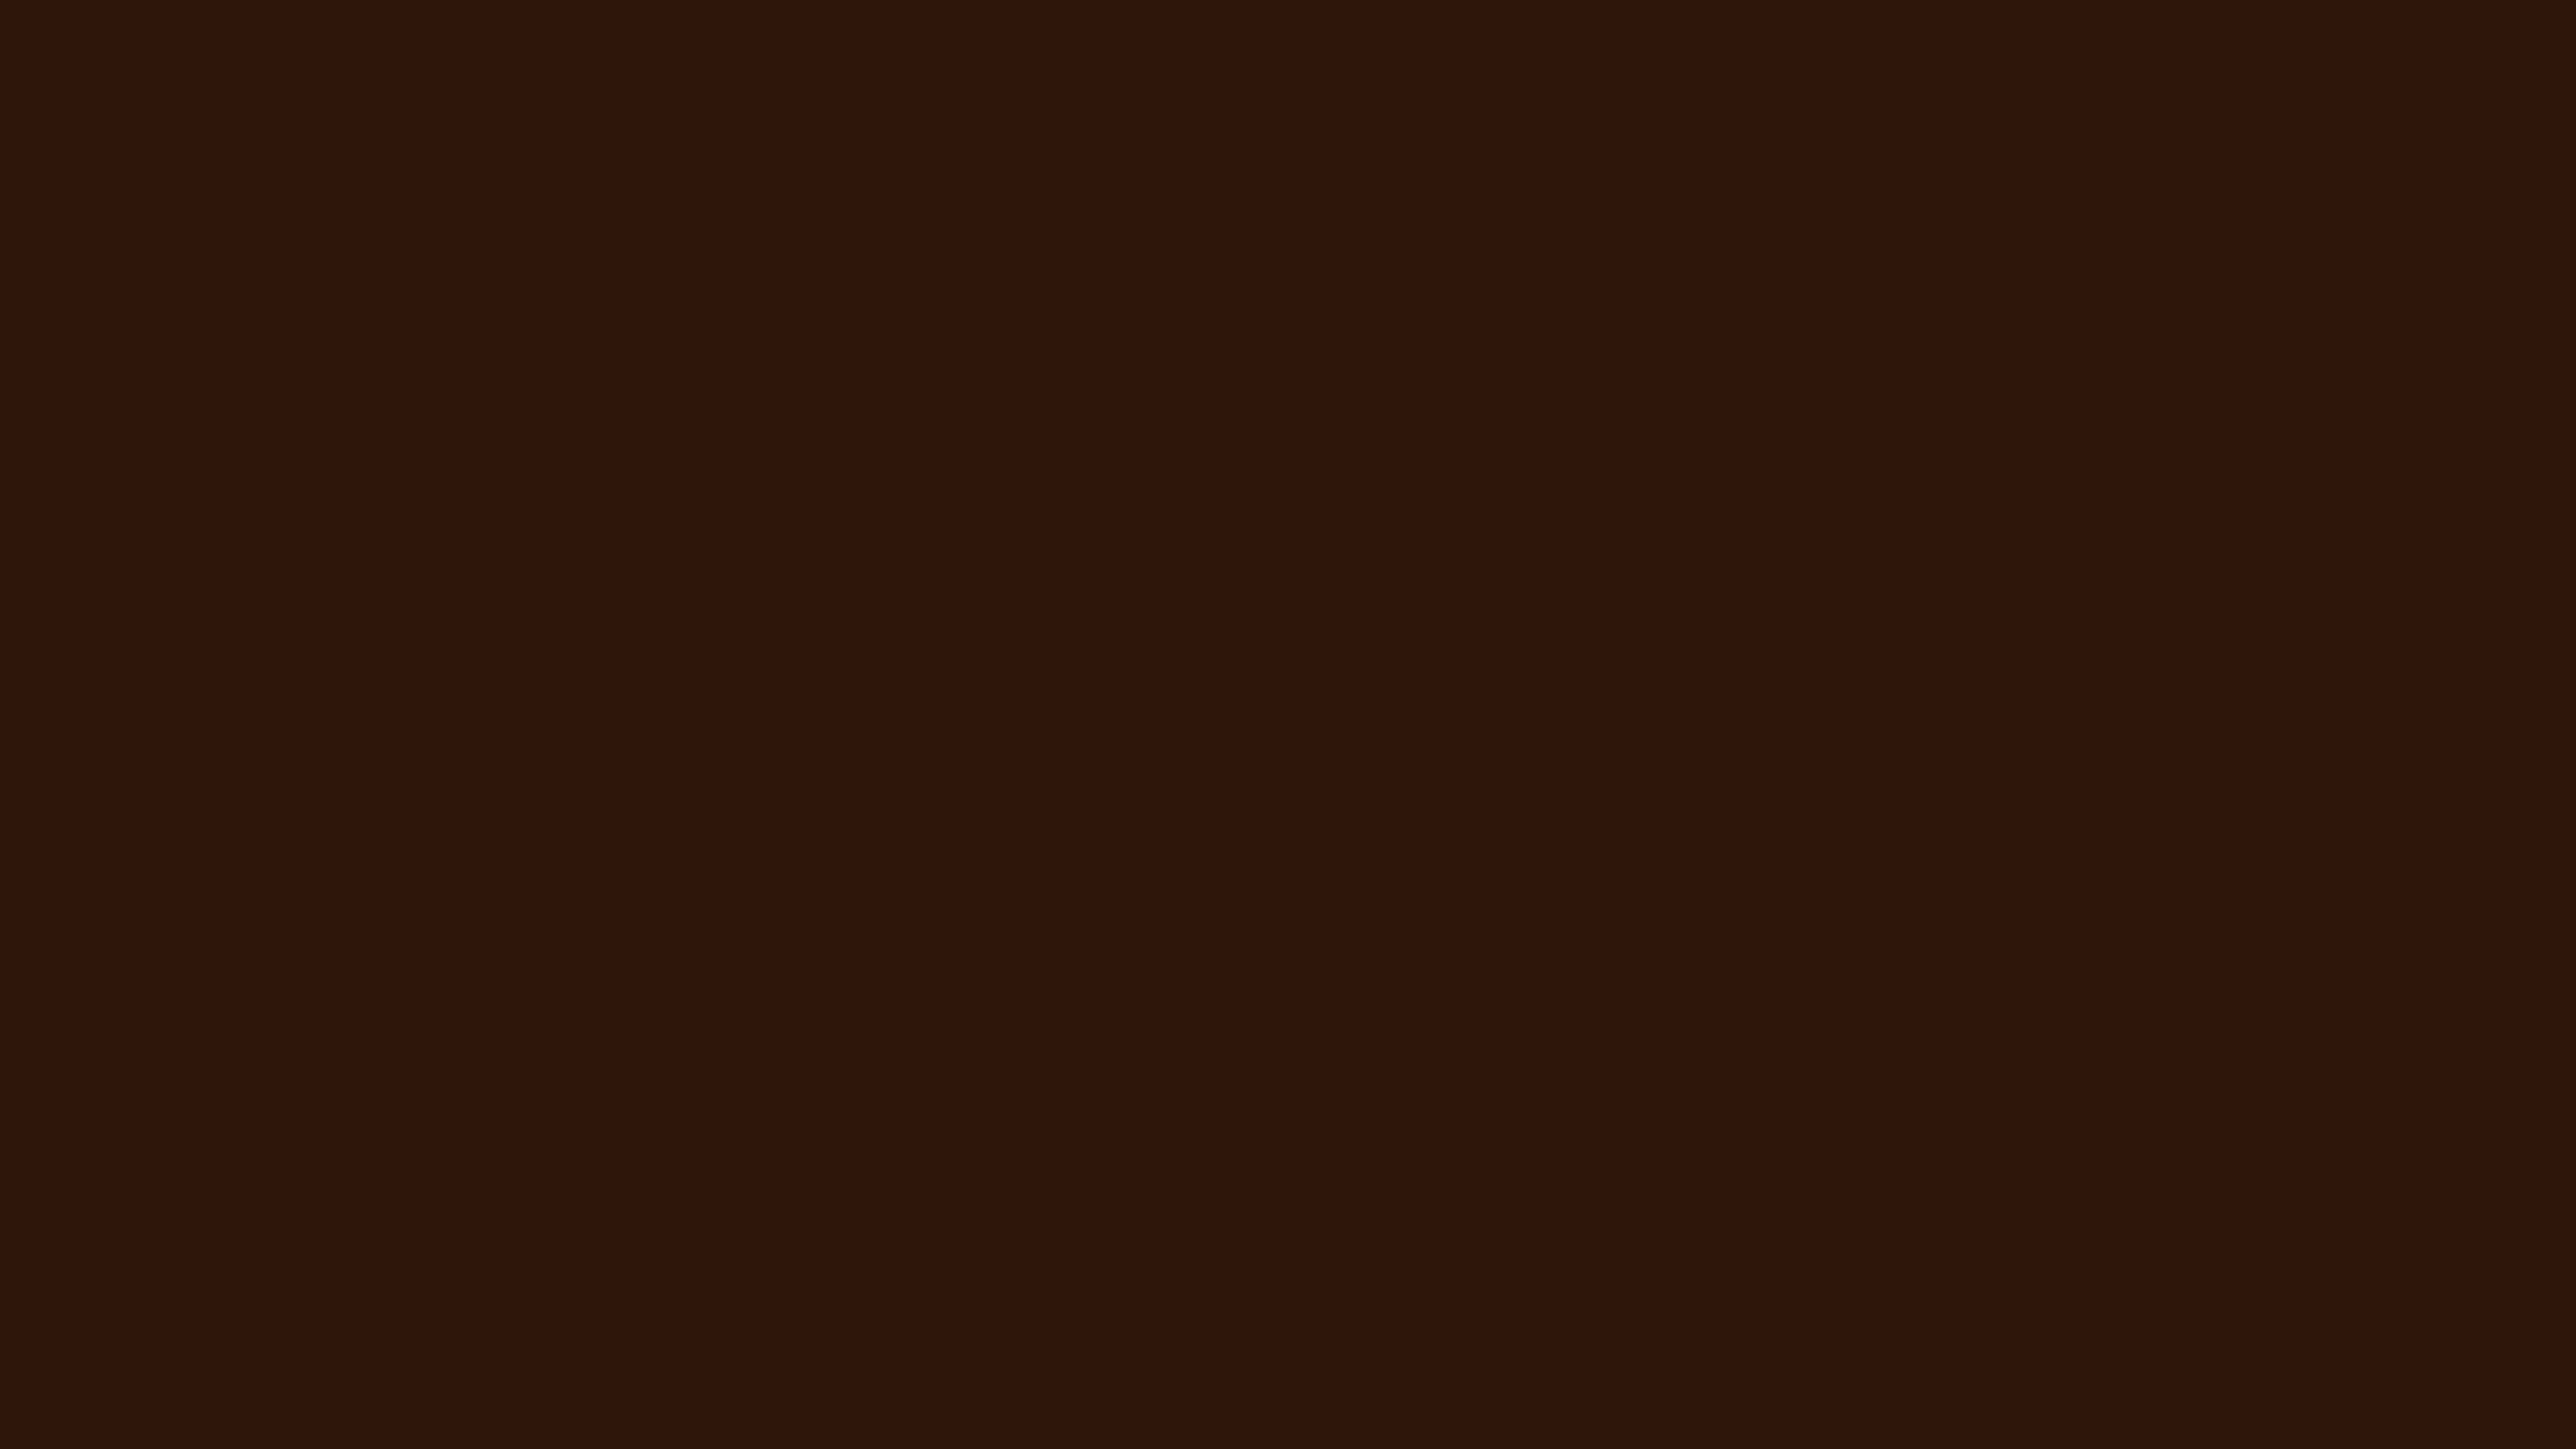 4096x2304 Zinnwaldite Brown Solid Color Background